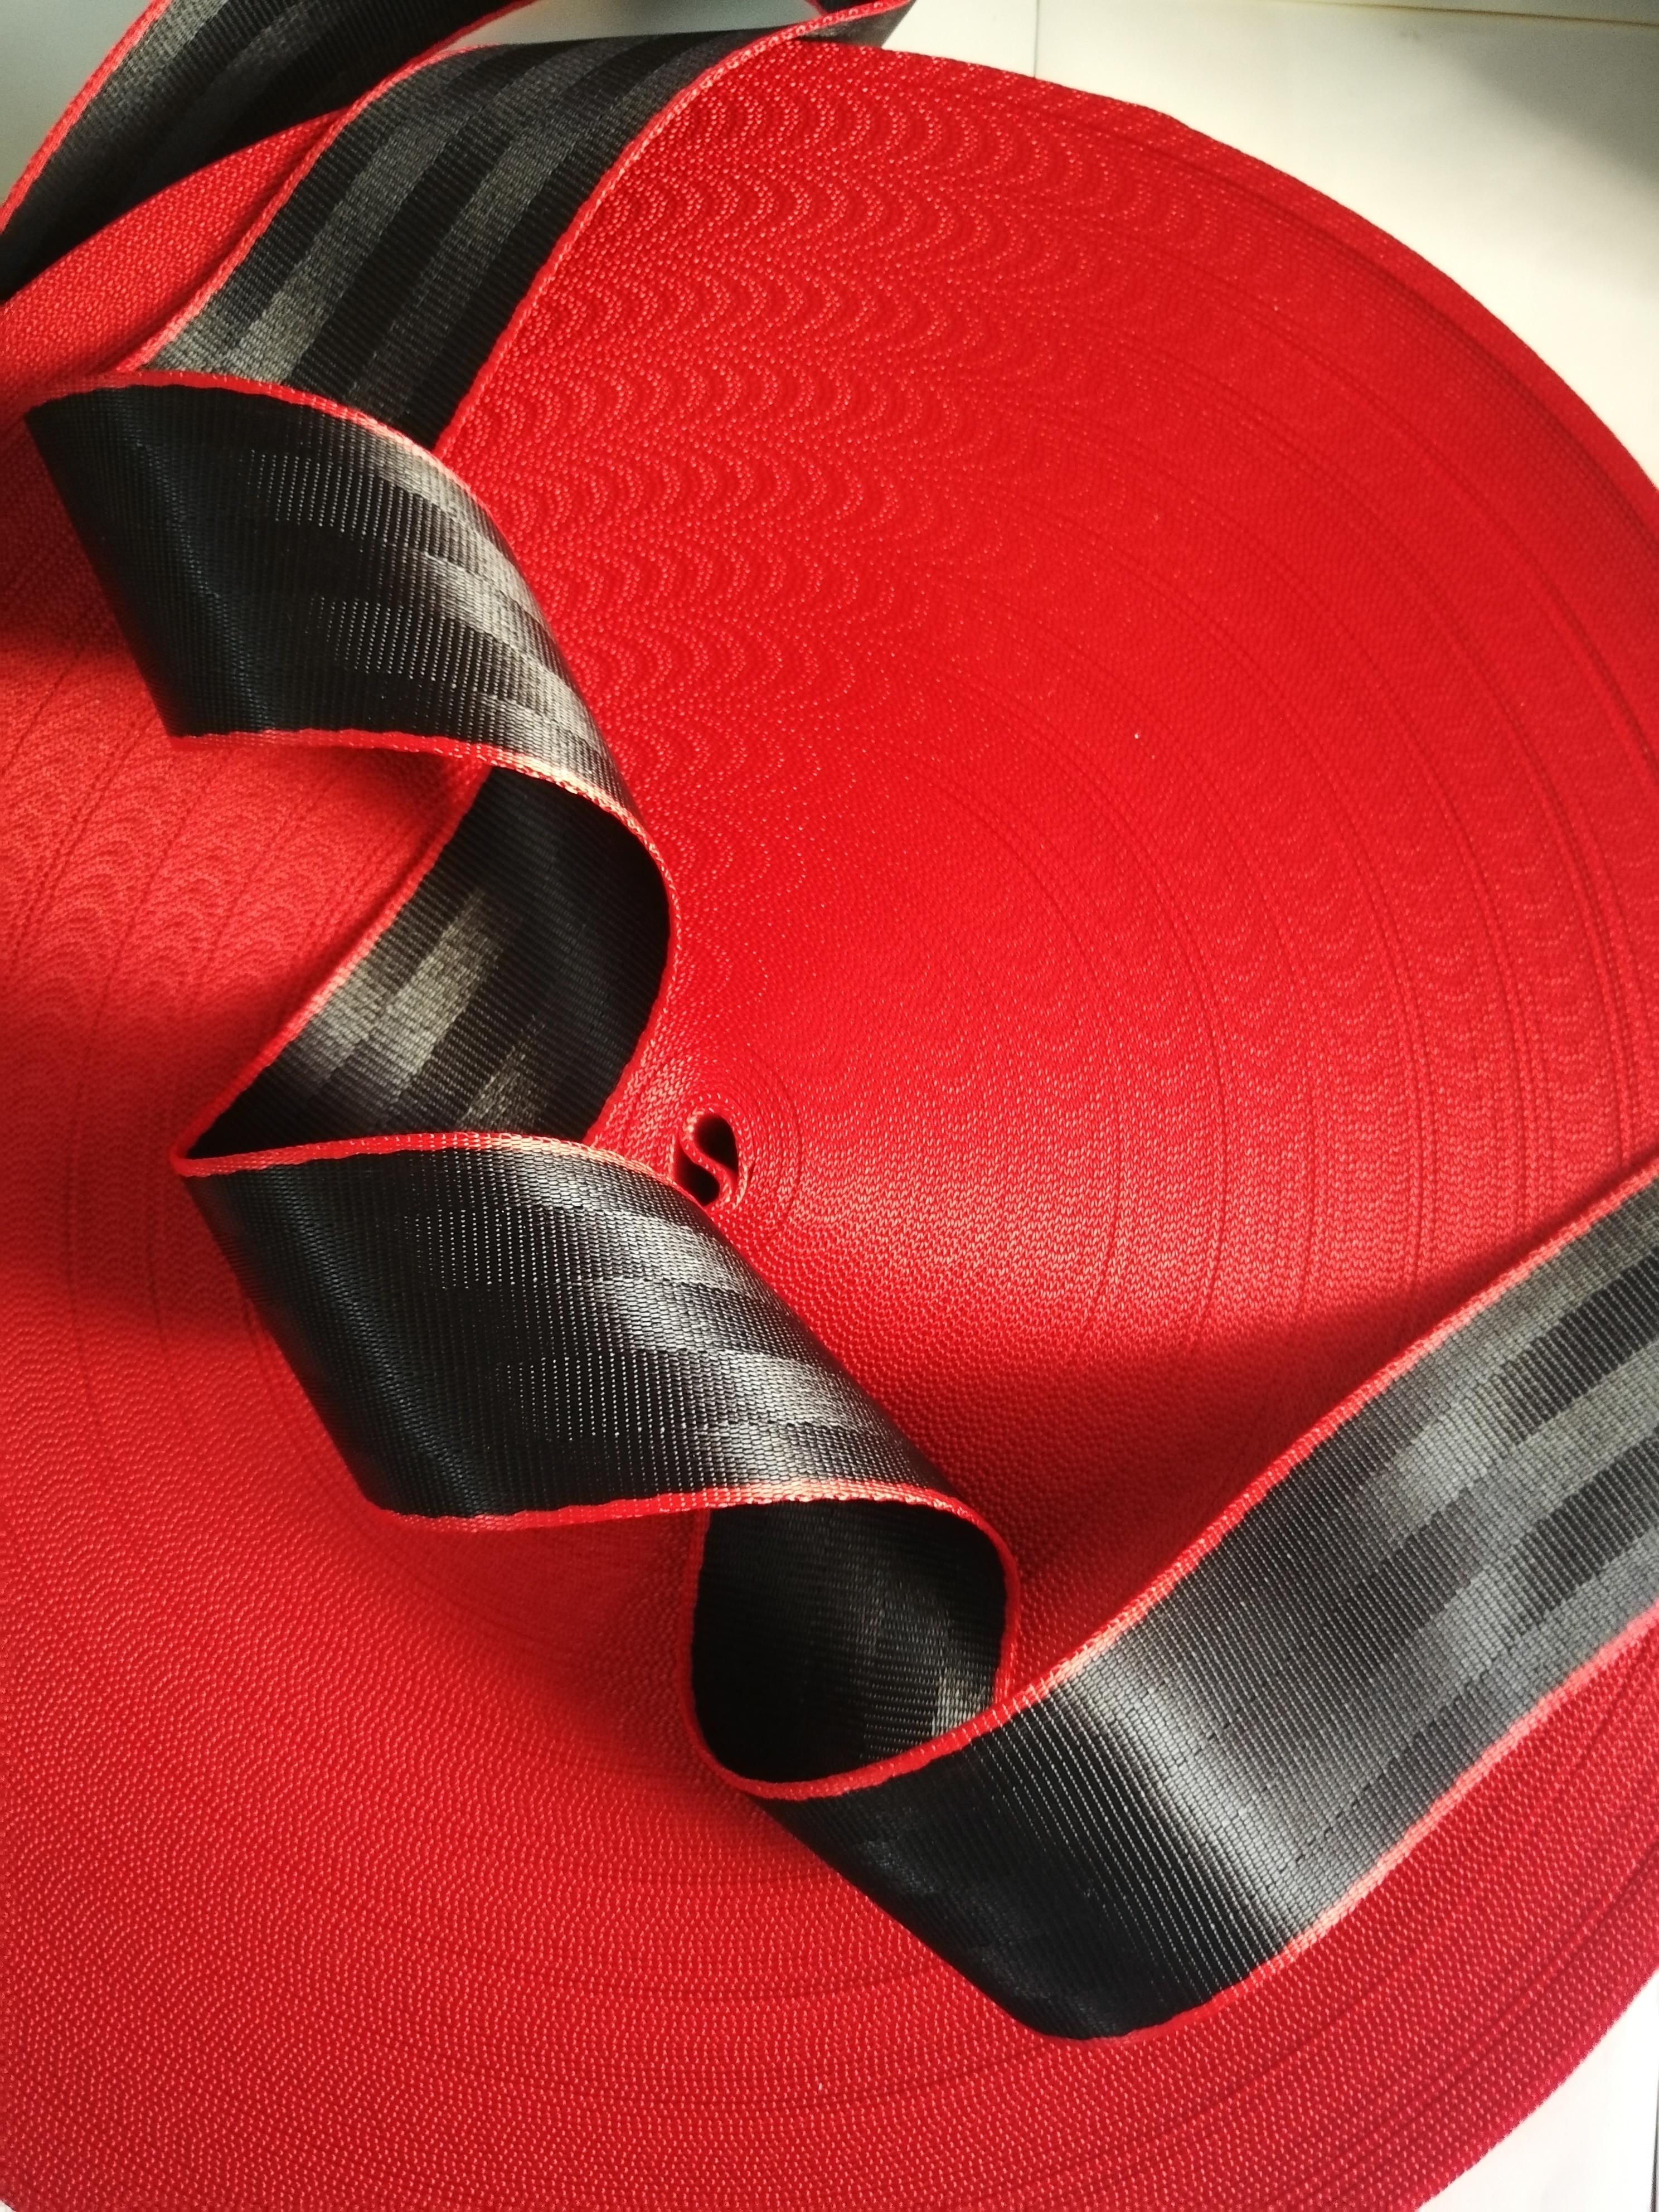 XIMOOR 4M-36M Black-red Car Seat Belt Webbing Universal Car Personalized Modification Seat Belt Webbing Car Accessories